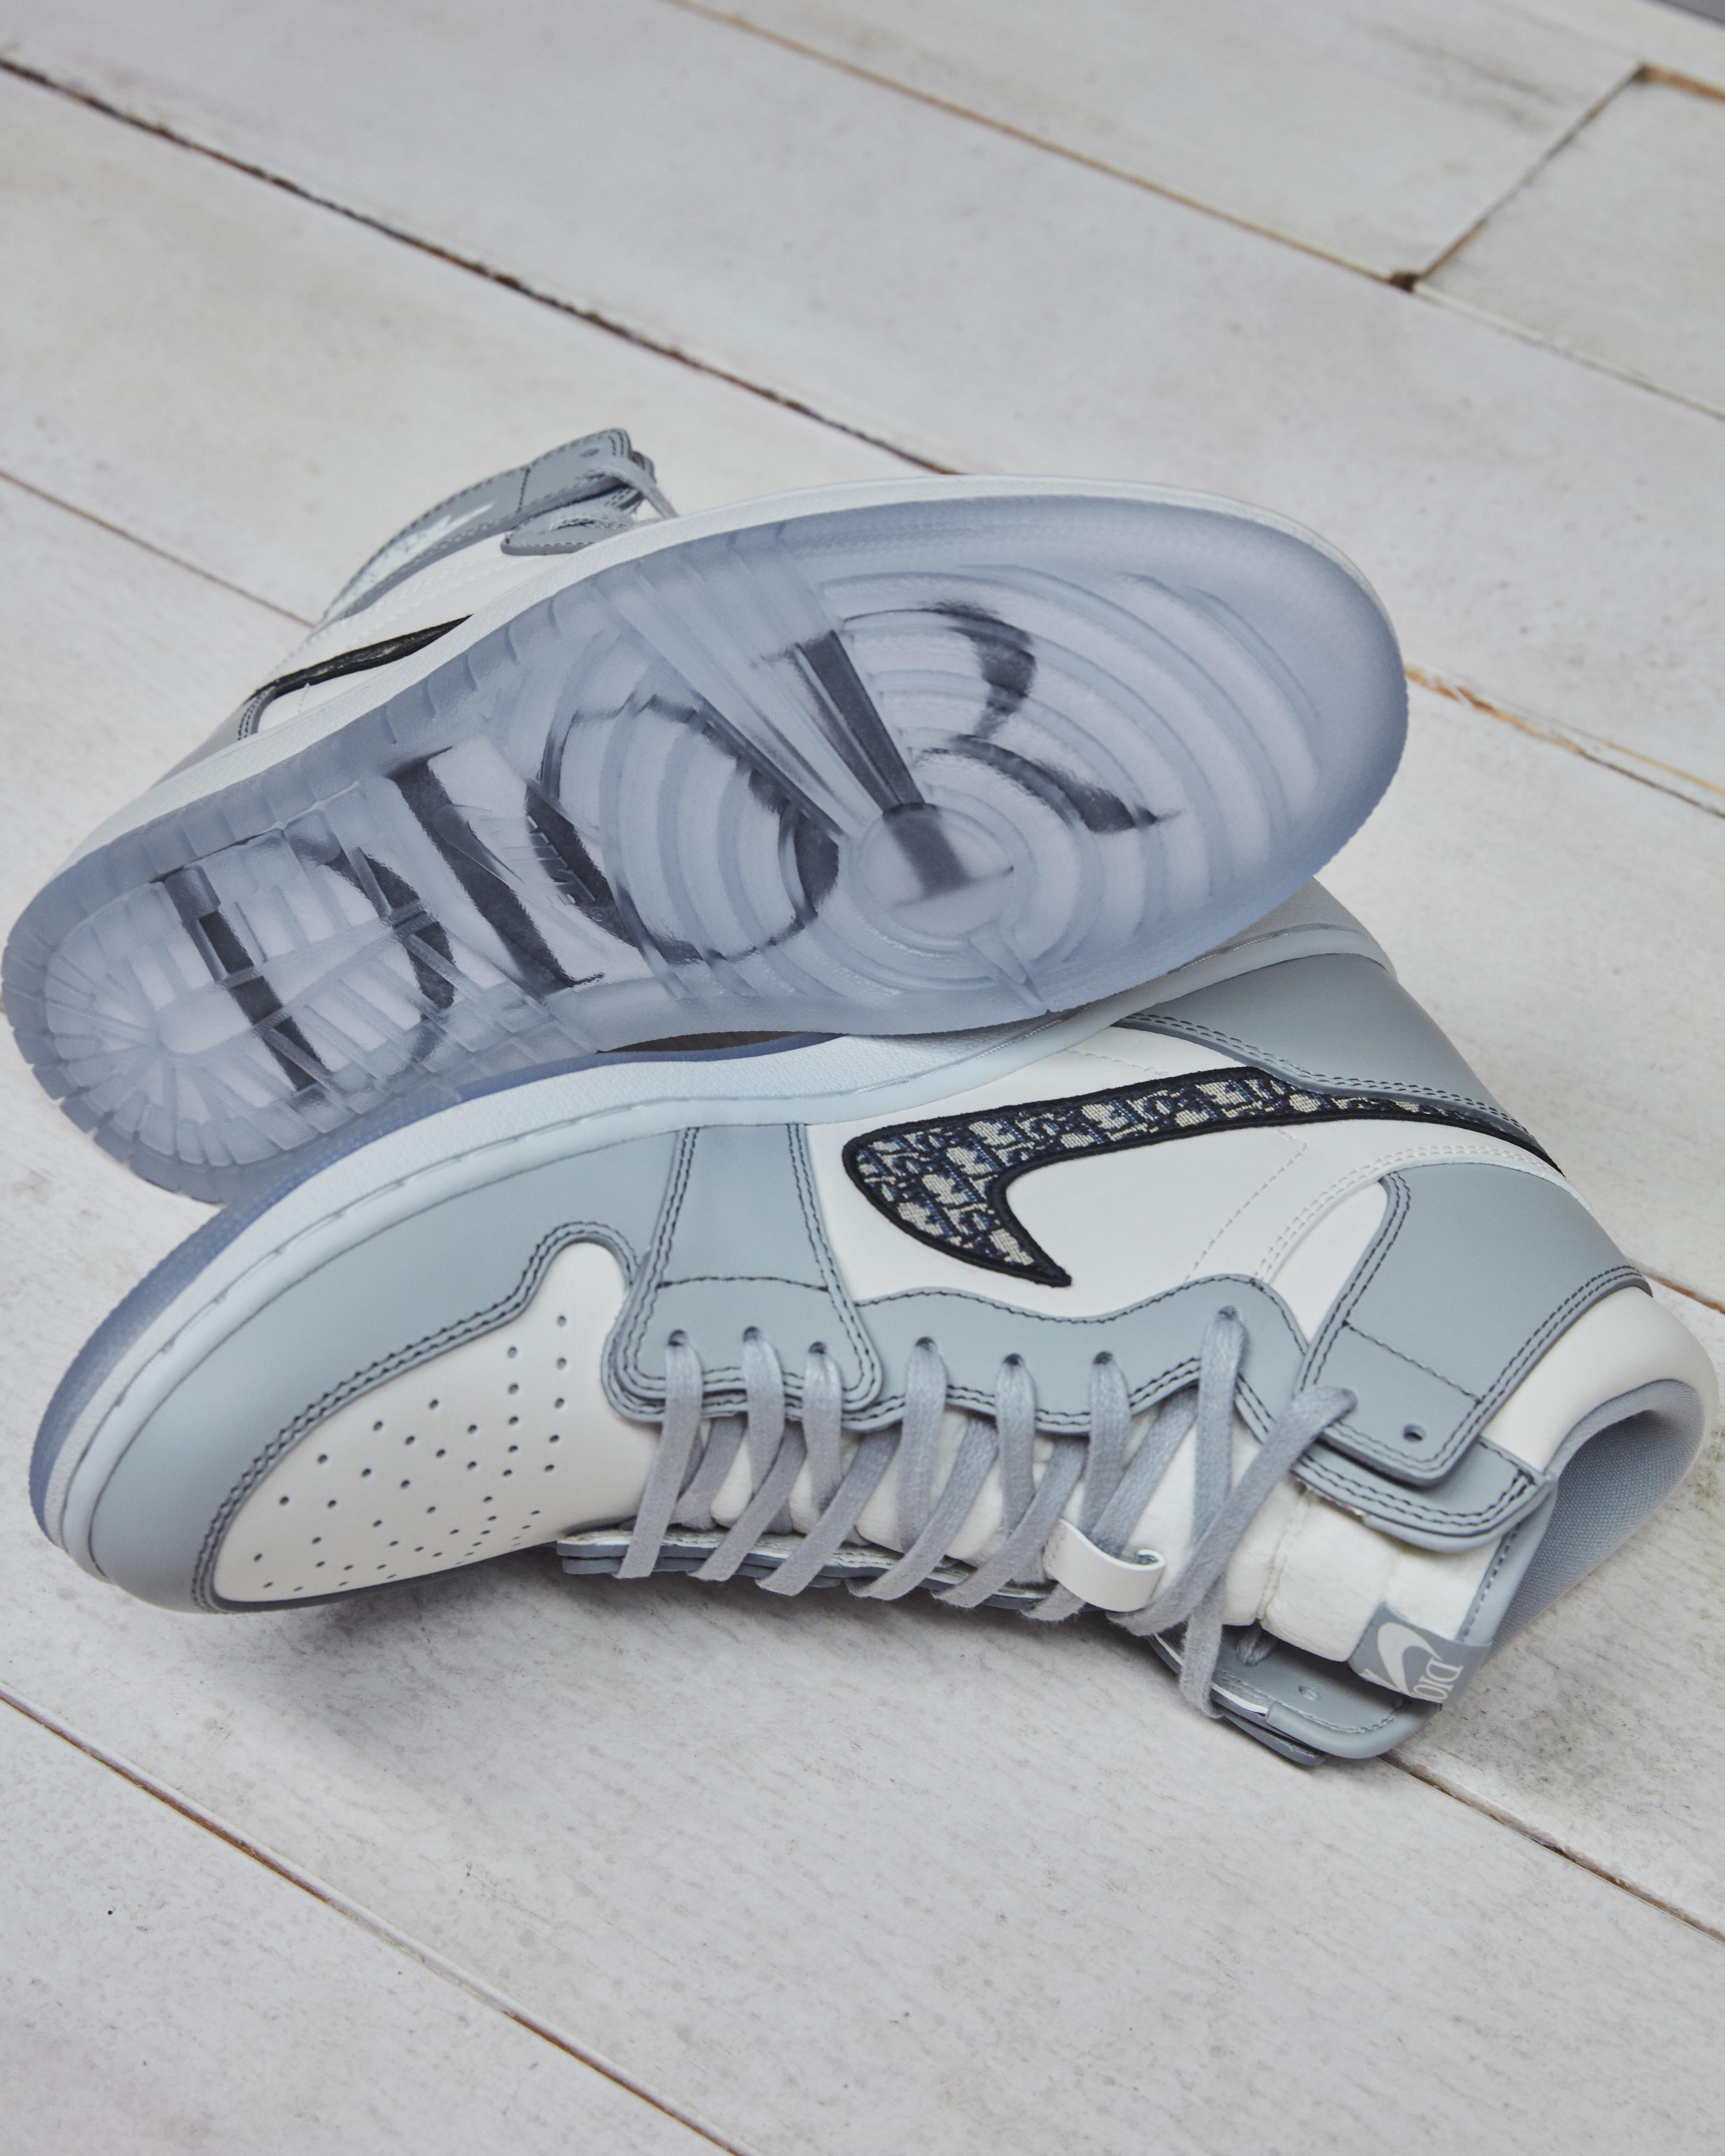 Nike S Jordan Brand Just Had Its First Billion Dollar Quarter Quartz Get the best deal for clear jordana eye makeup from the largest online selection at ebay.com. nike s jordan brand just had its first